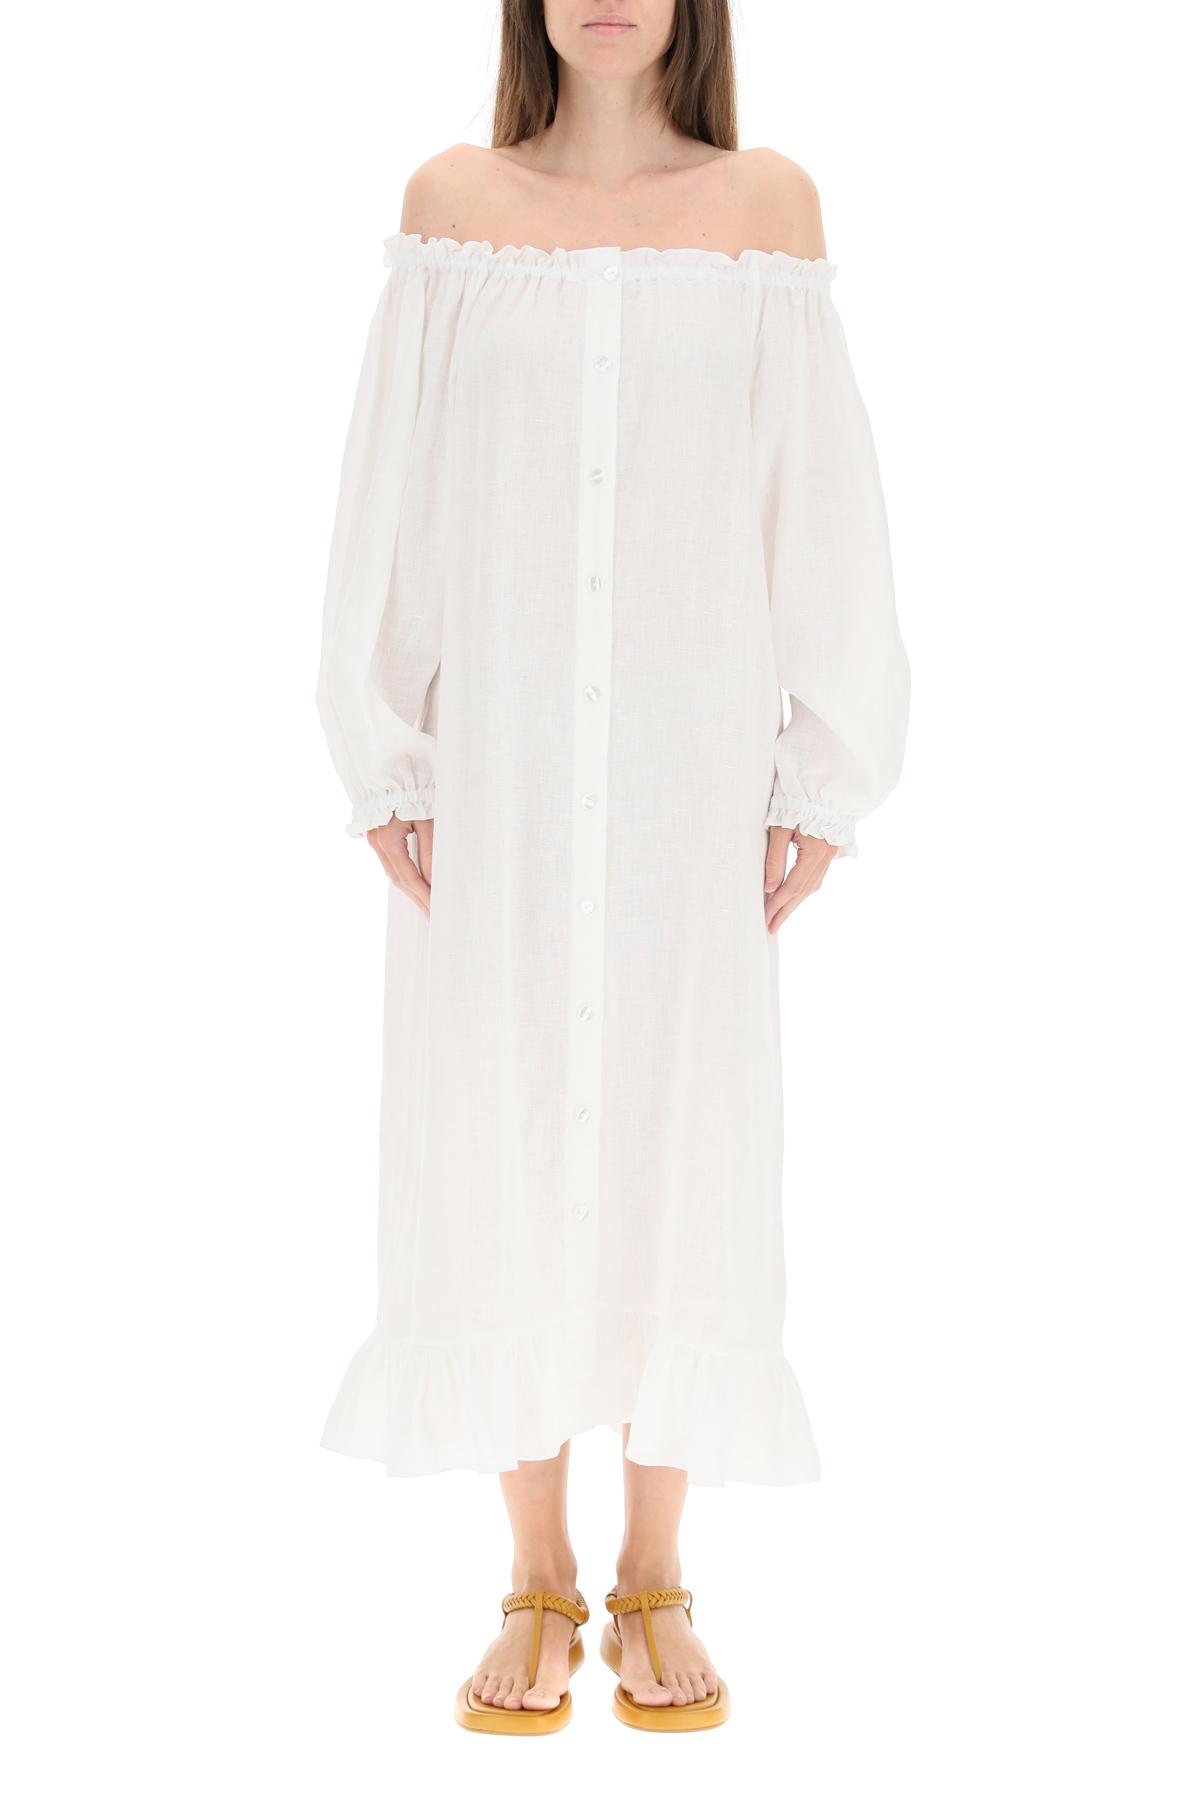 Sleeper abito loungewear in lino